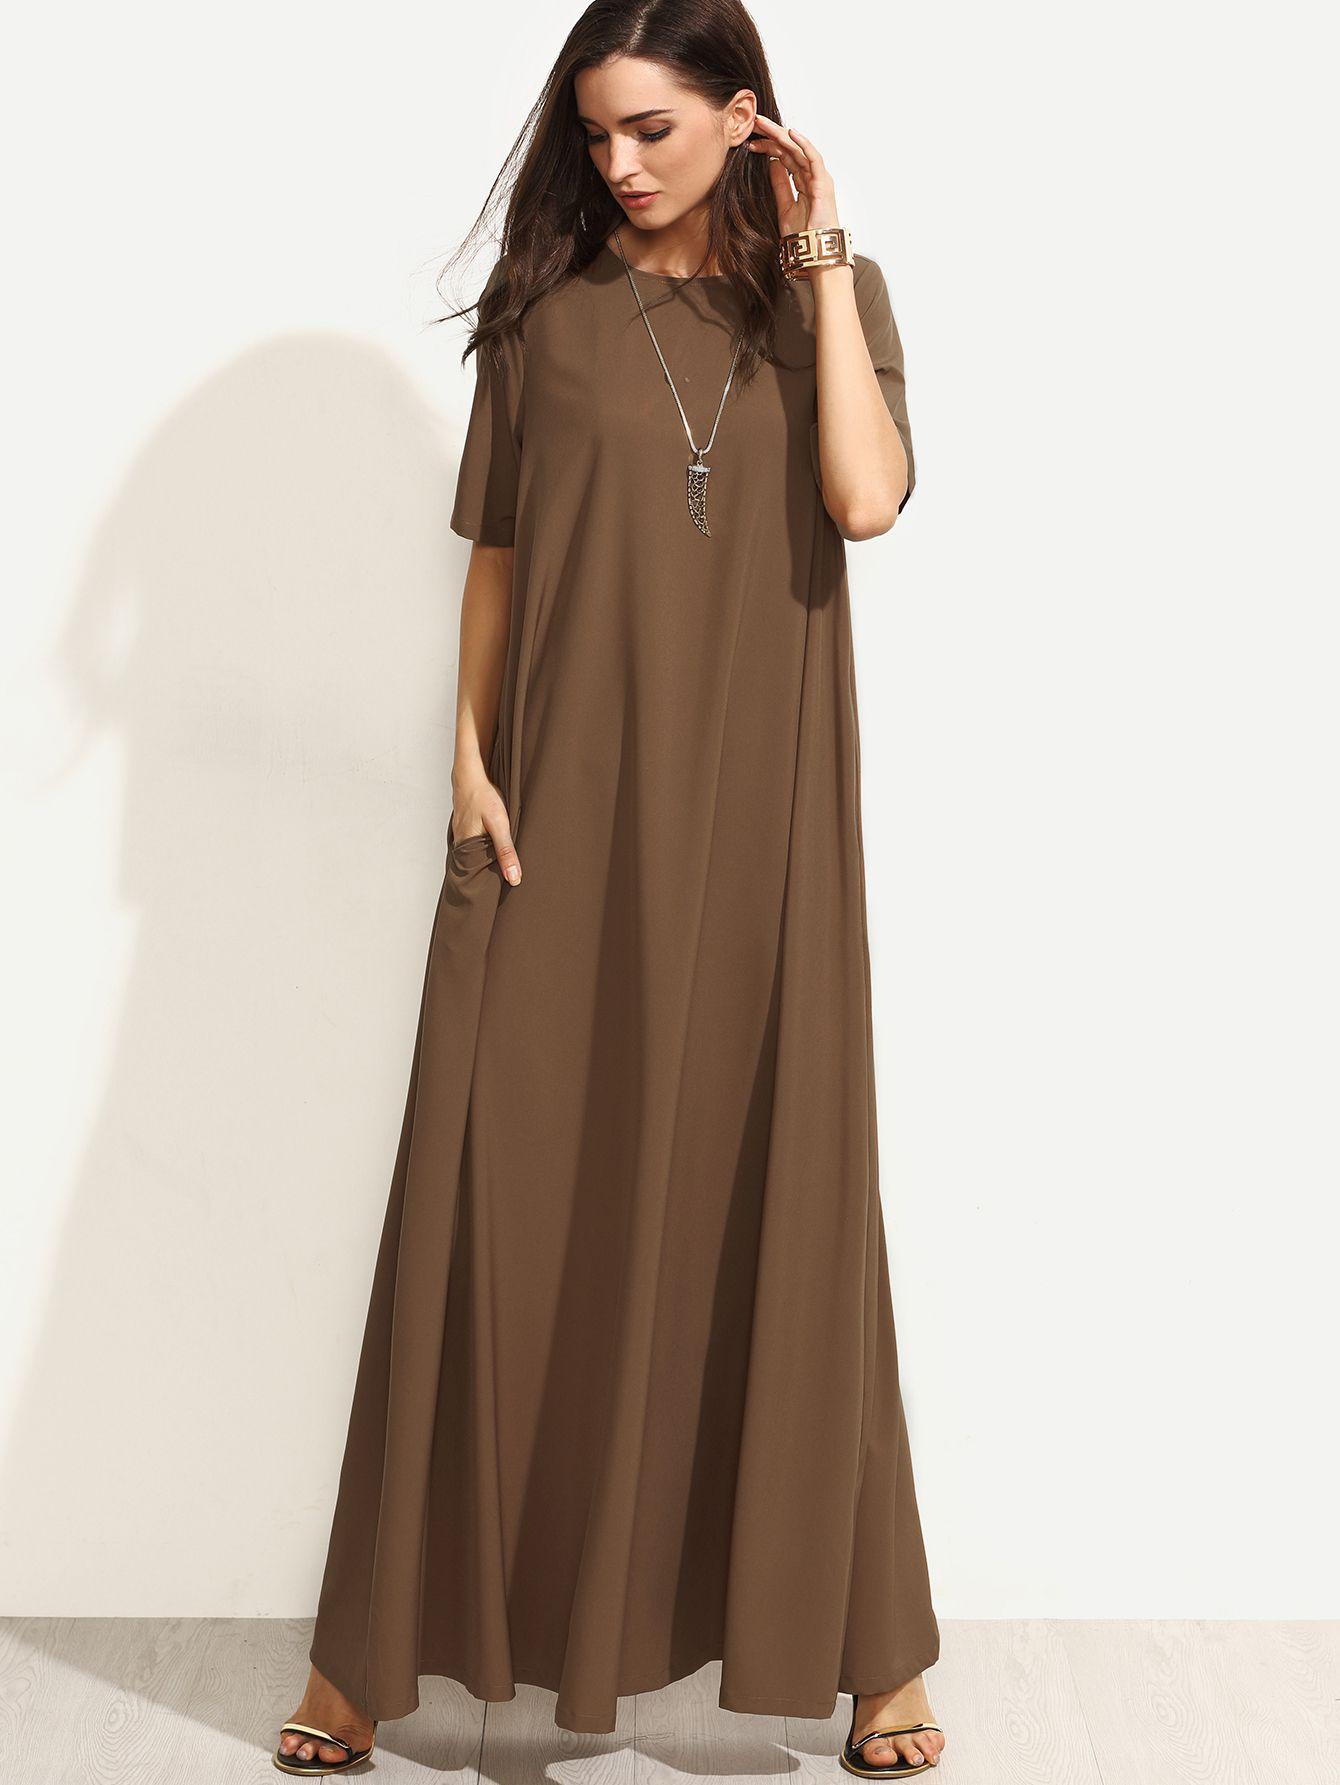 Vestido manga corta cremallera maxi marrón brown shorts maxi